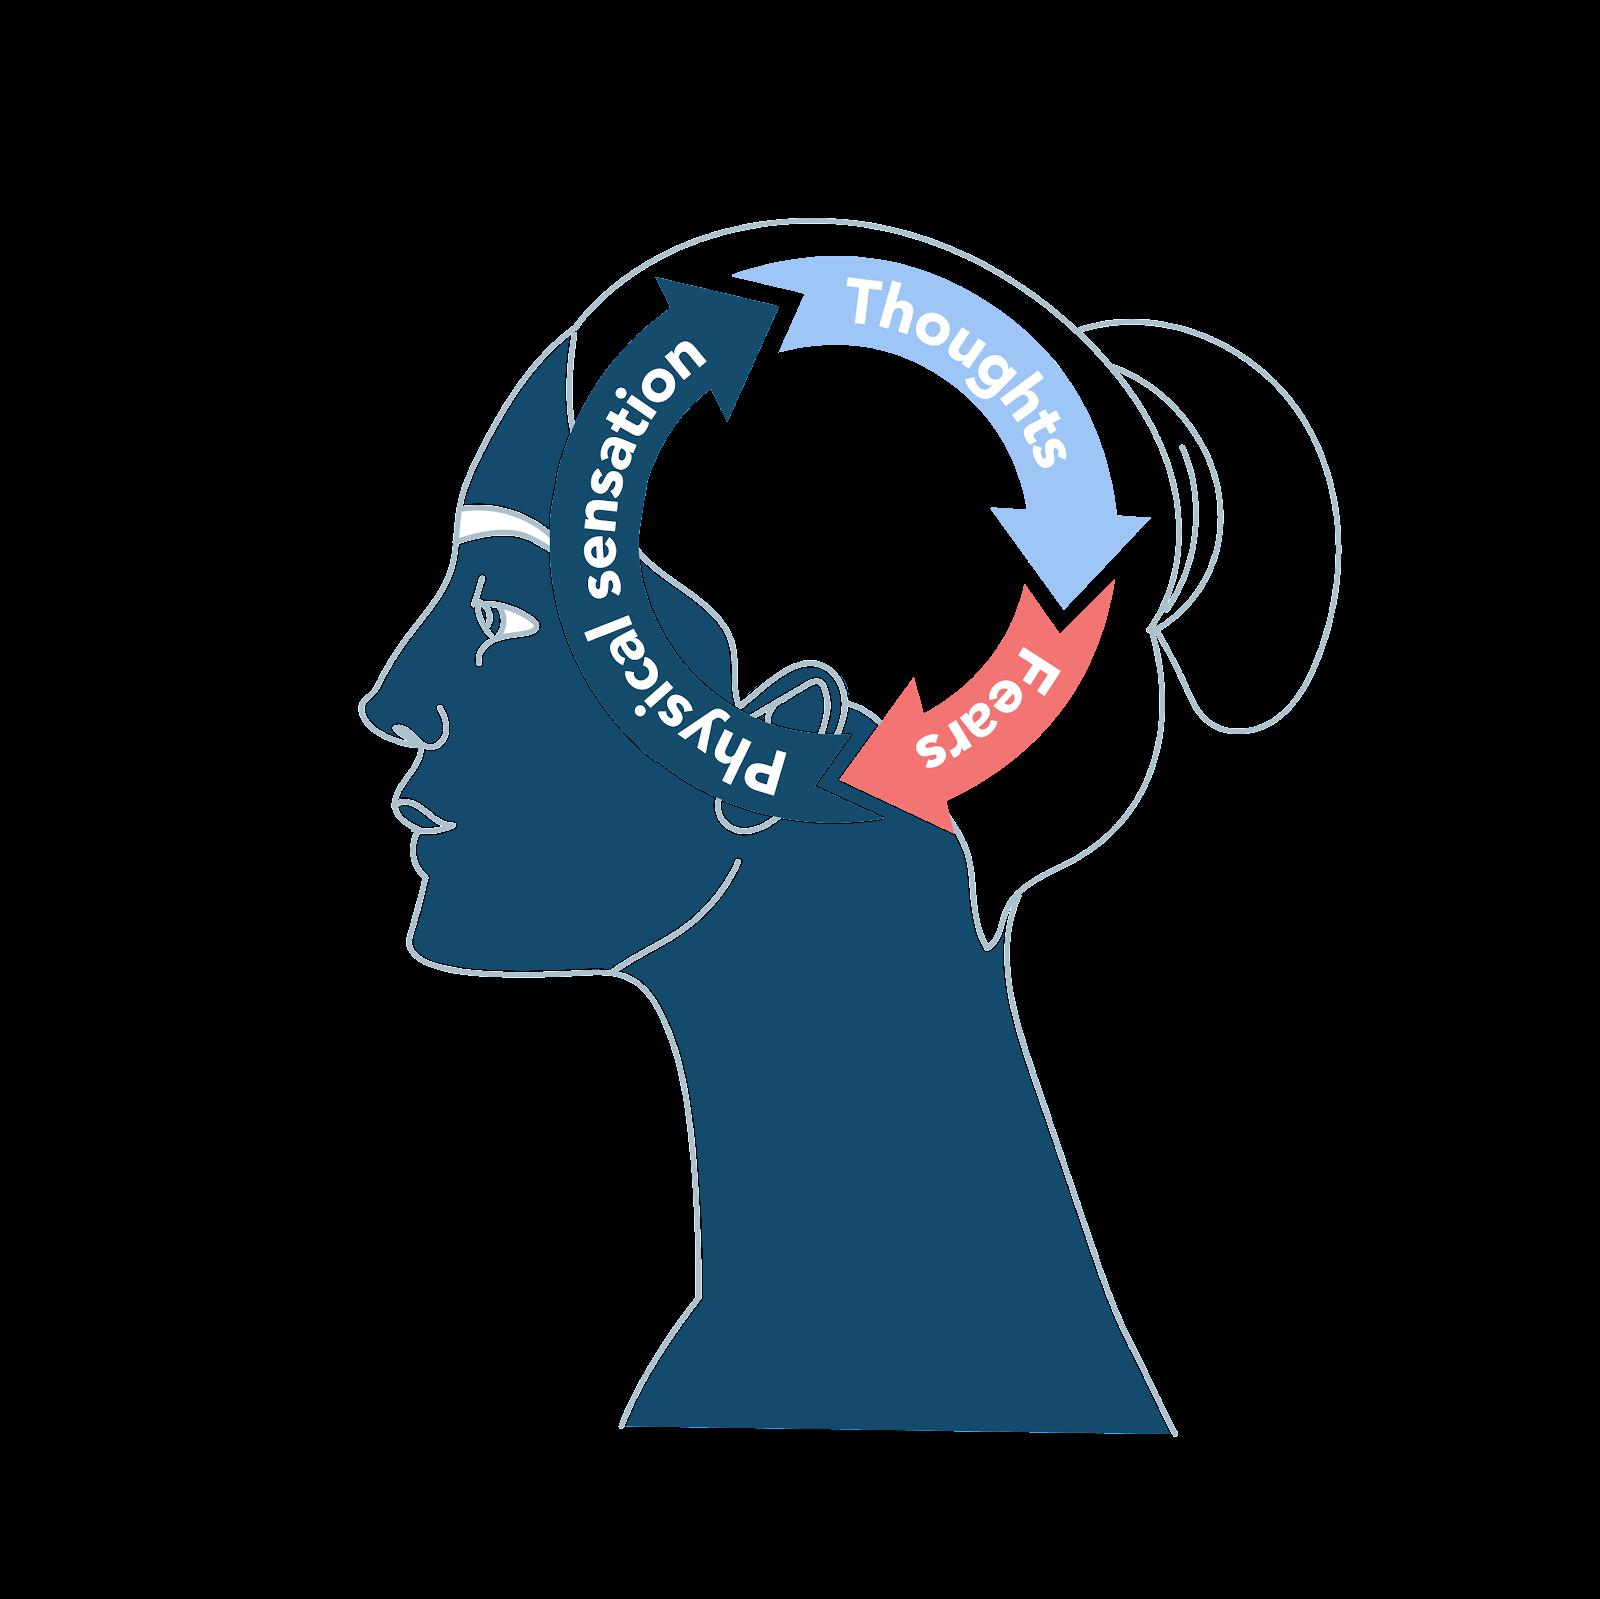 Health psychologist helps break negative thought patterns